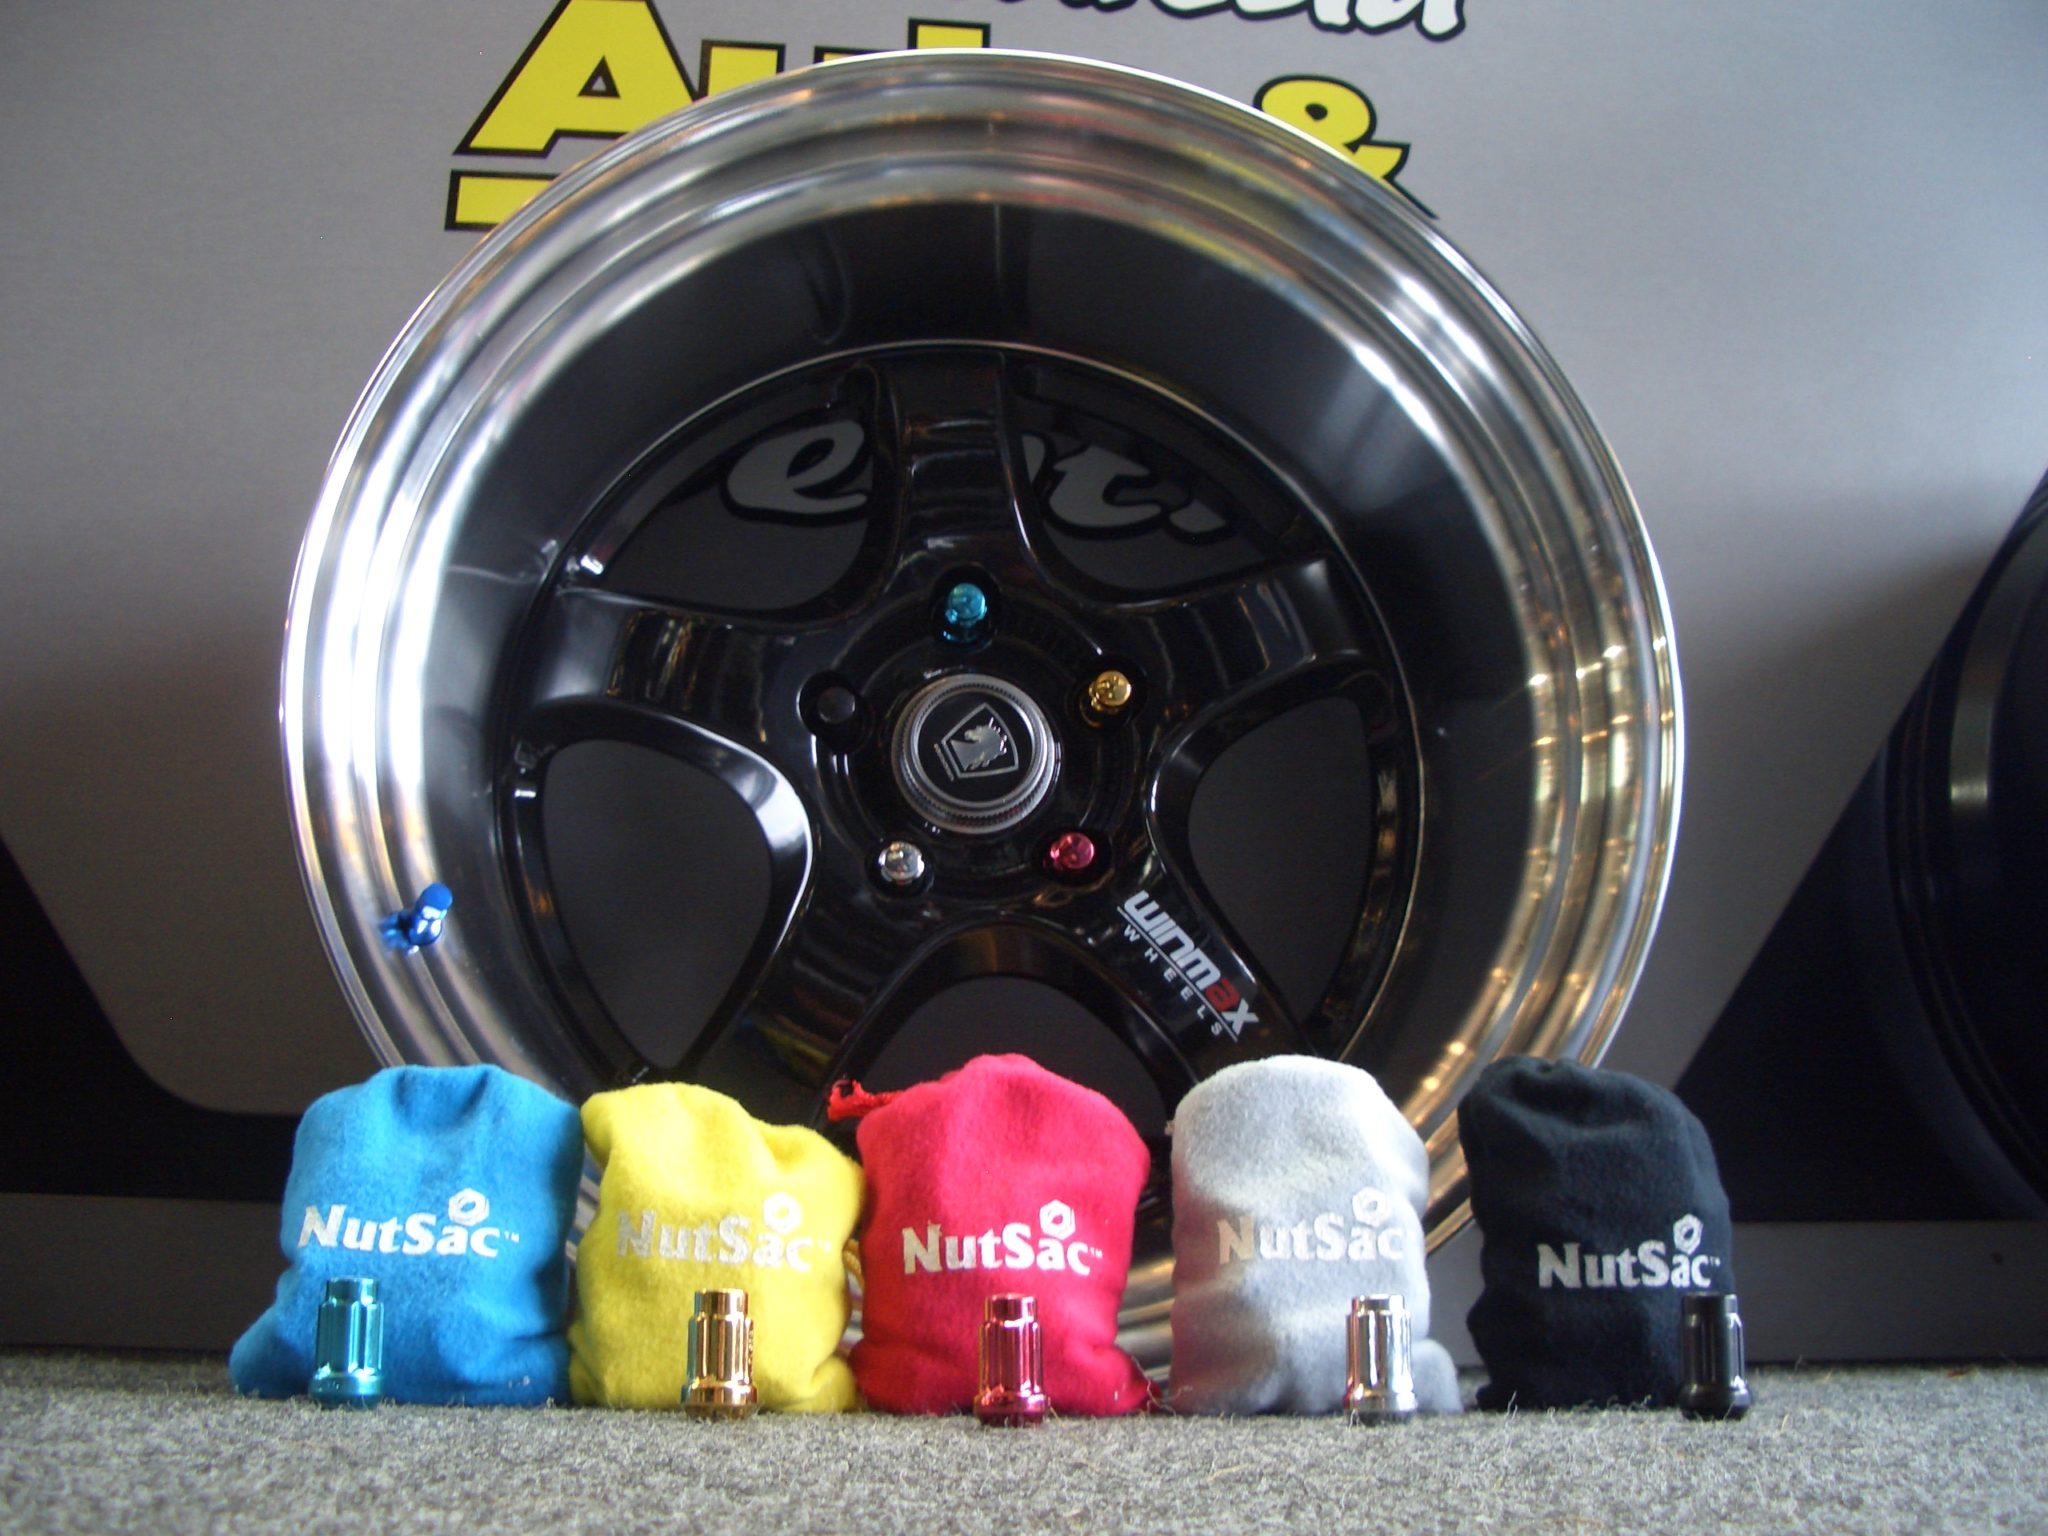 nutsac wheel nuts nz